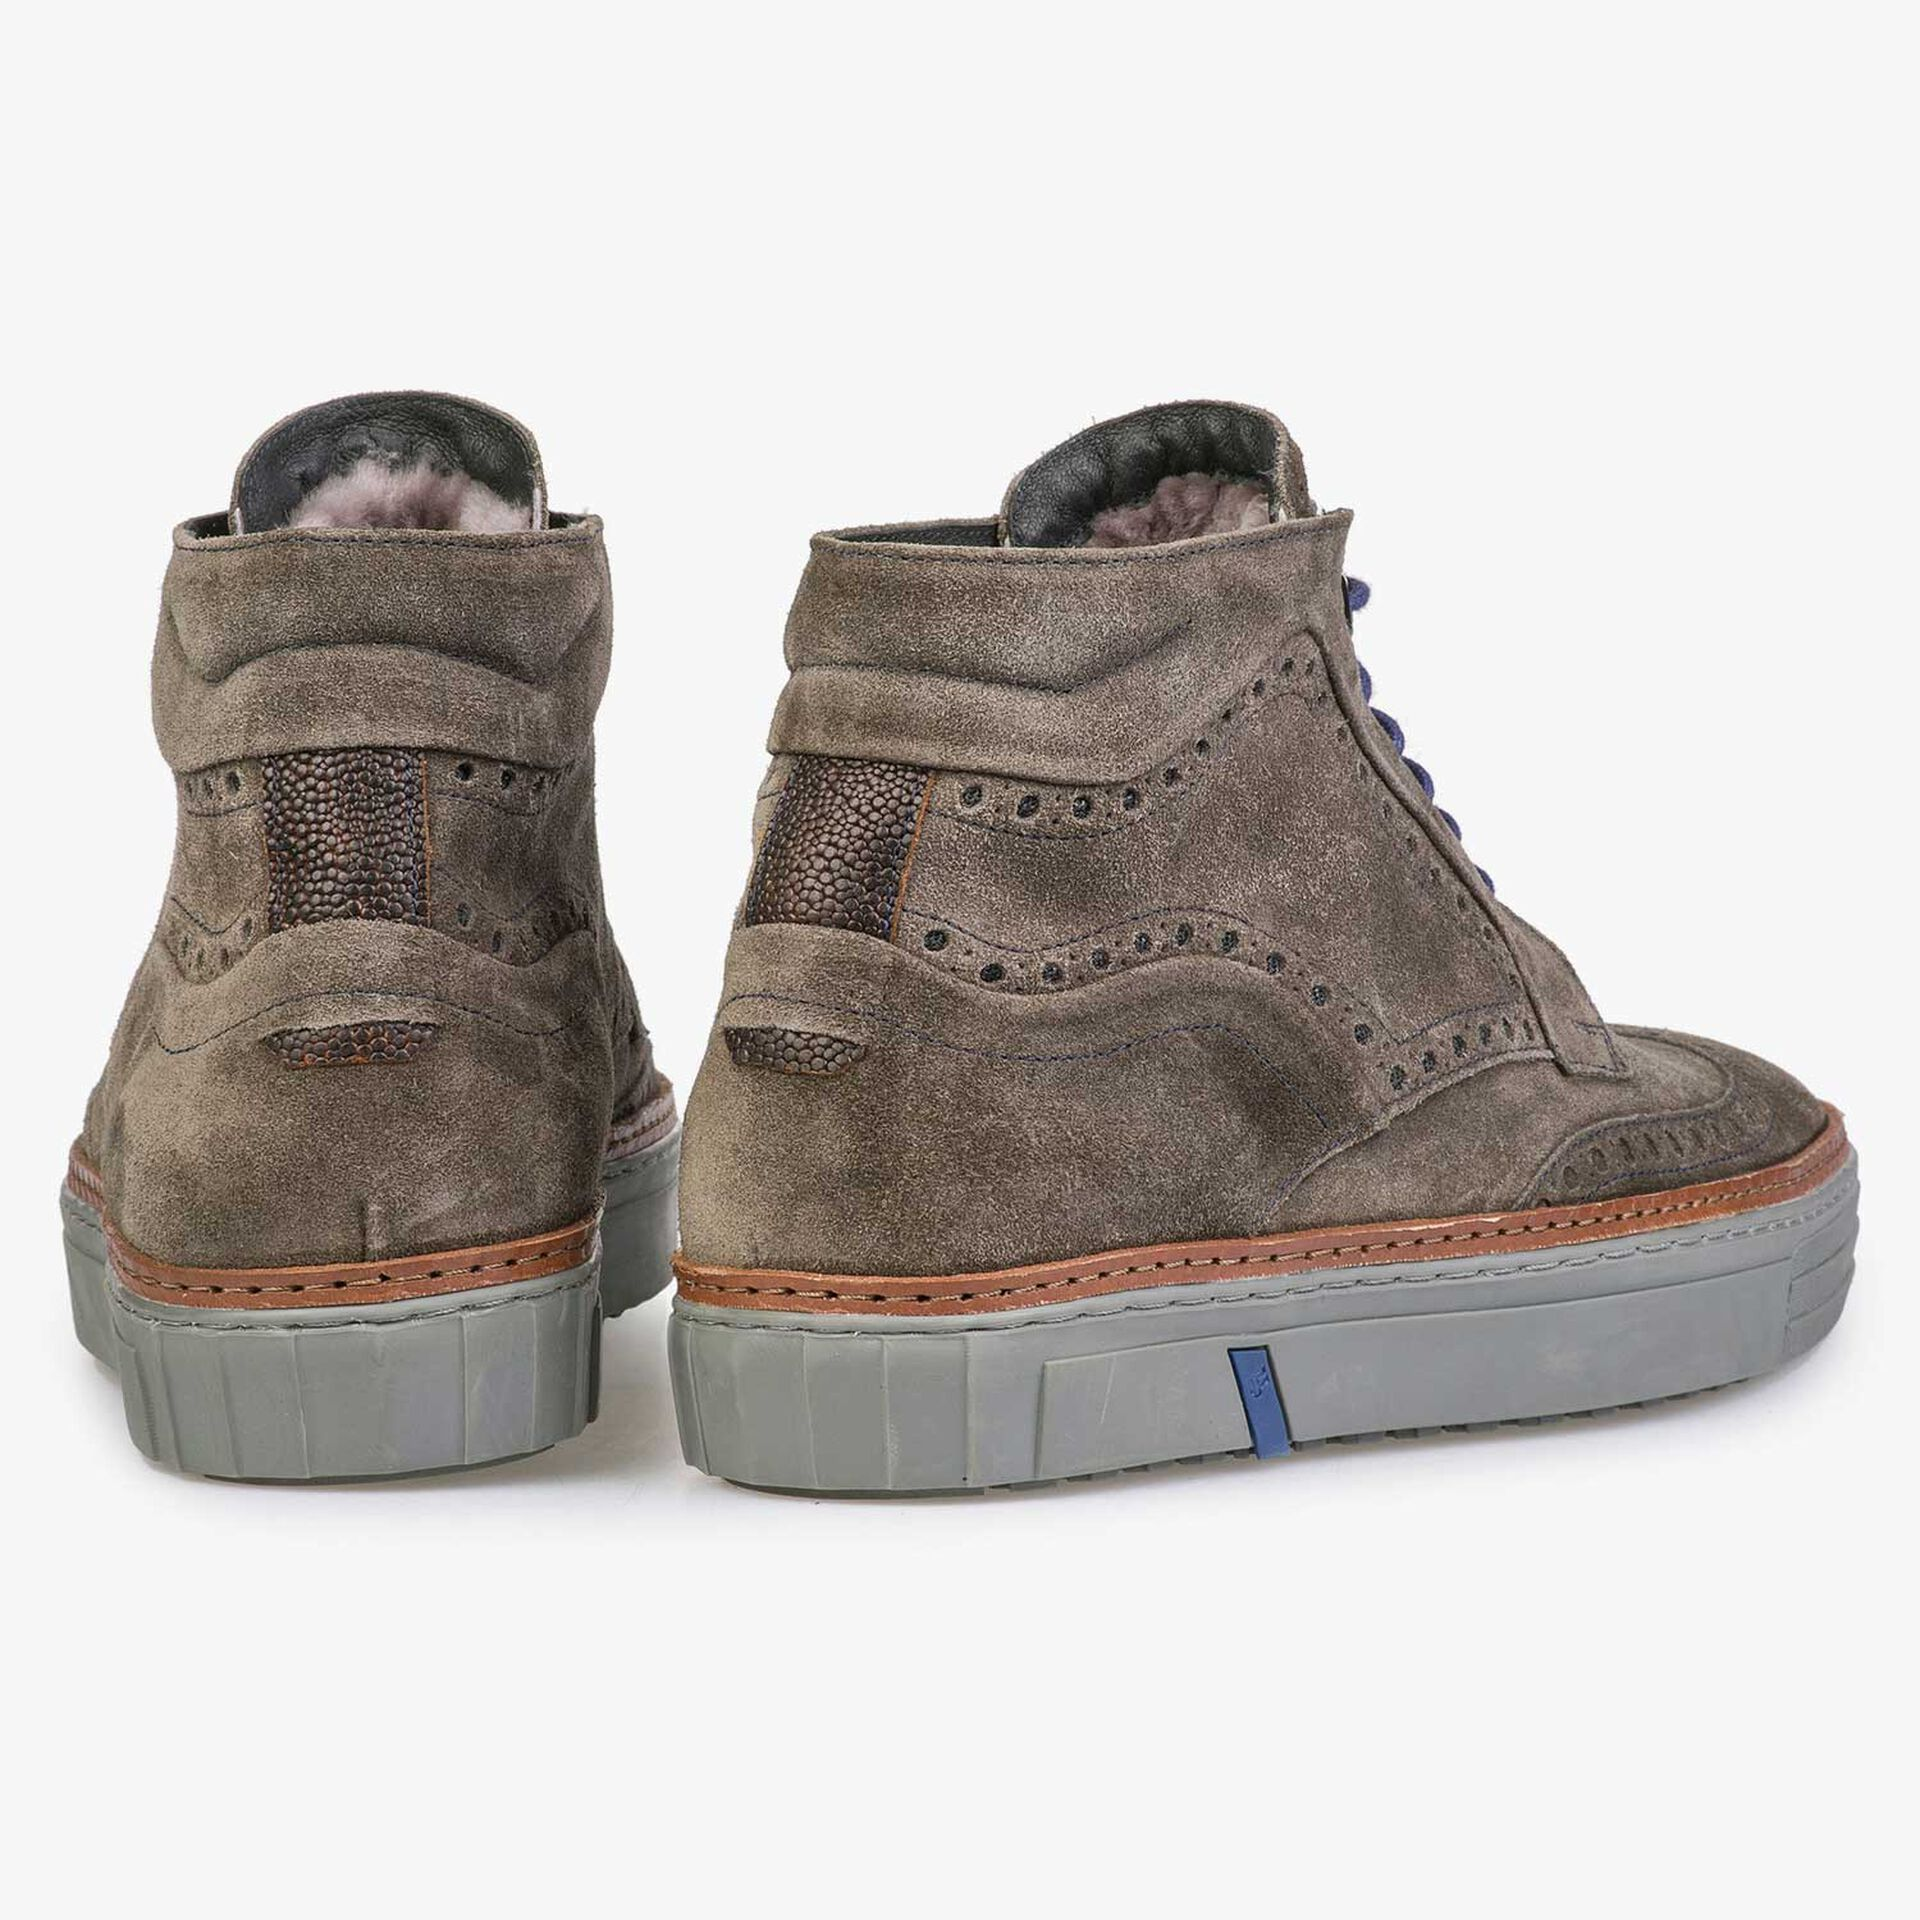 Mid-high, wool lined sneaker